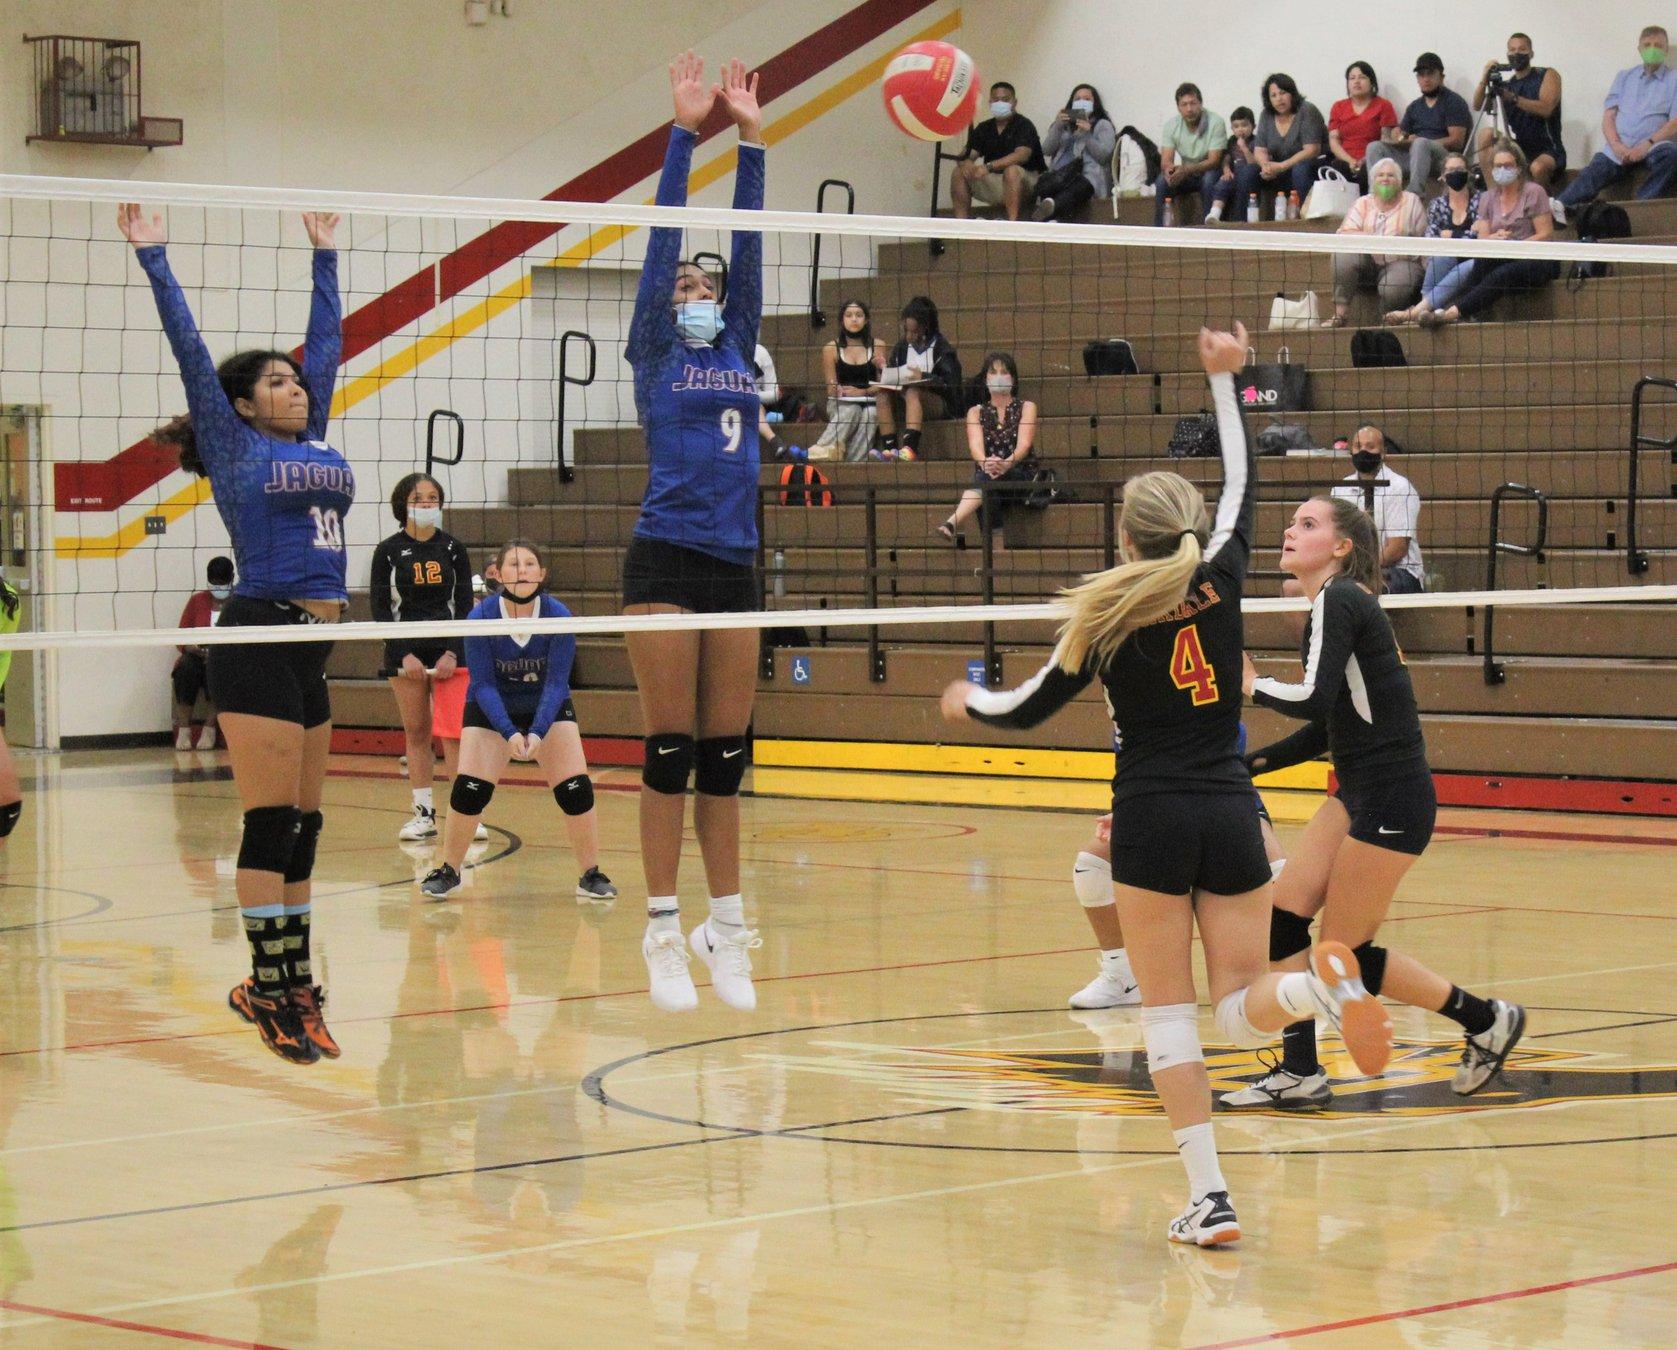 Girls Varsity Volleyball Zeroed By Eastchester in Season